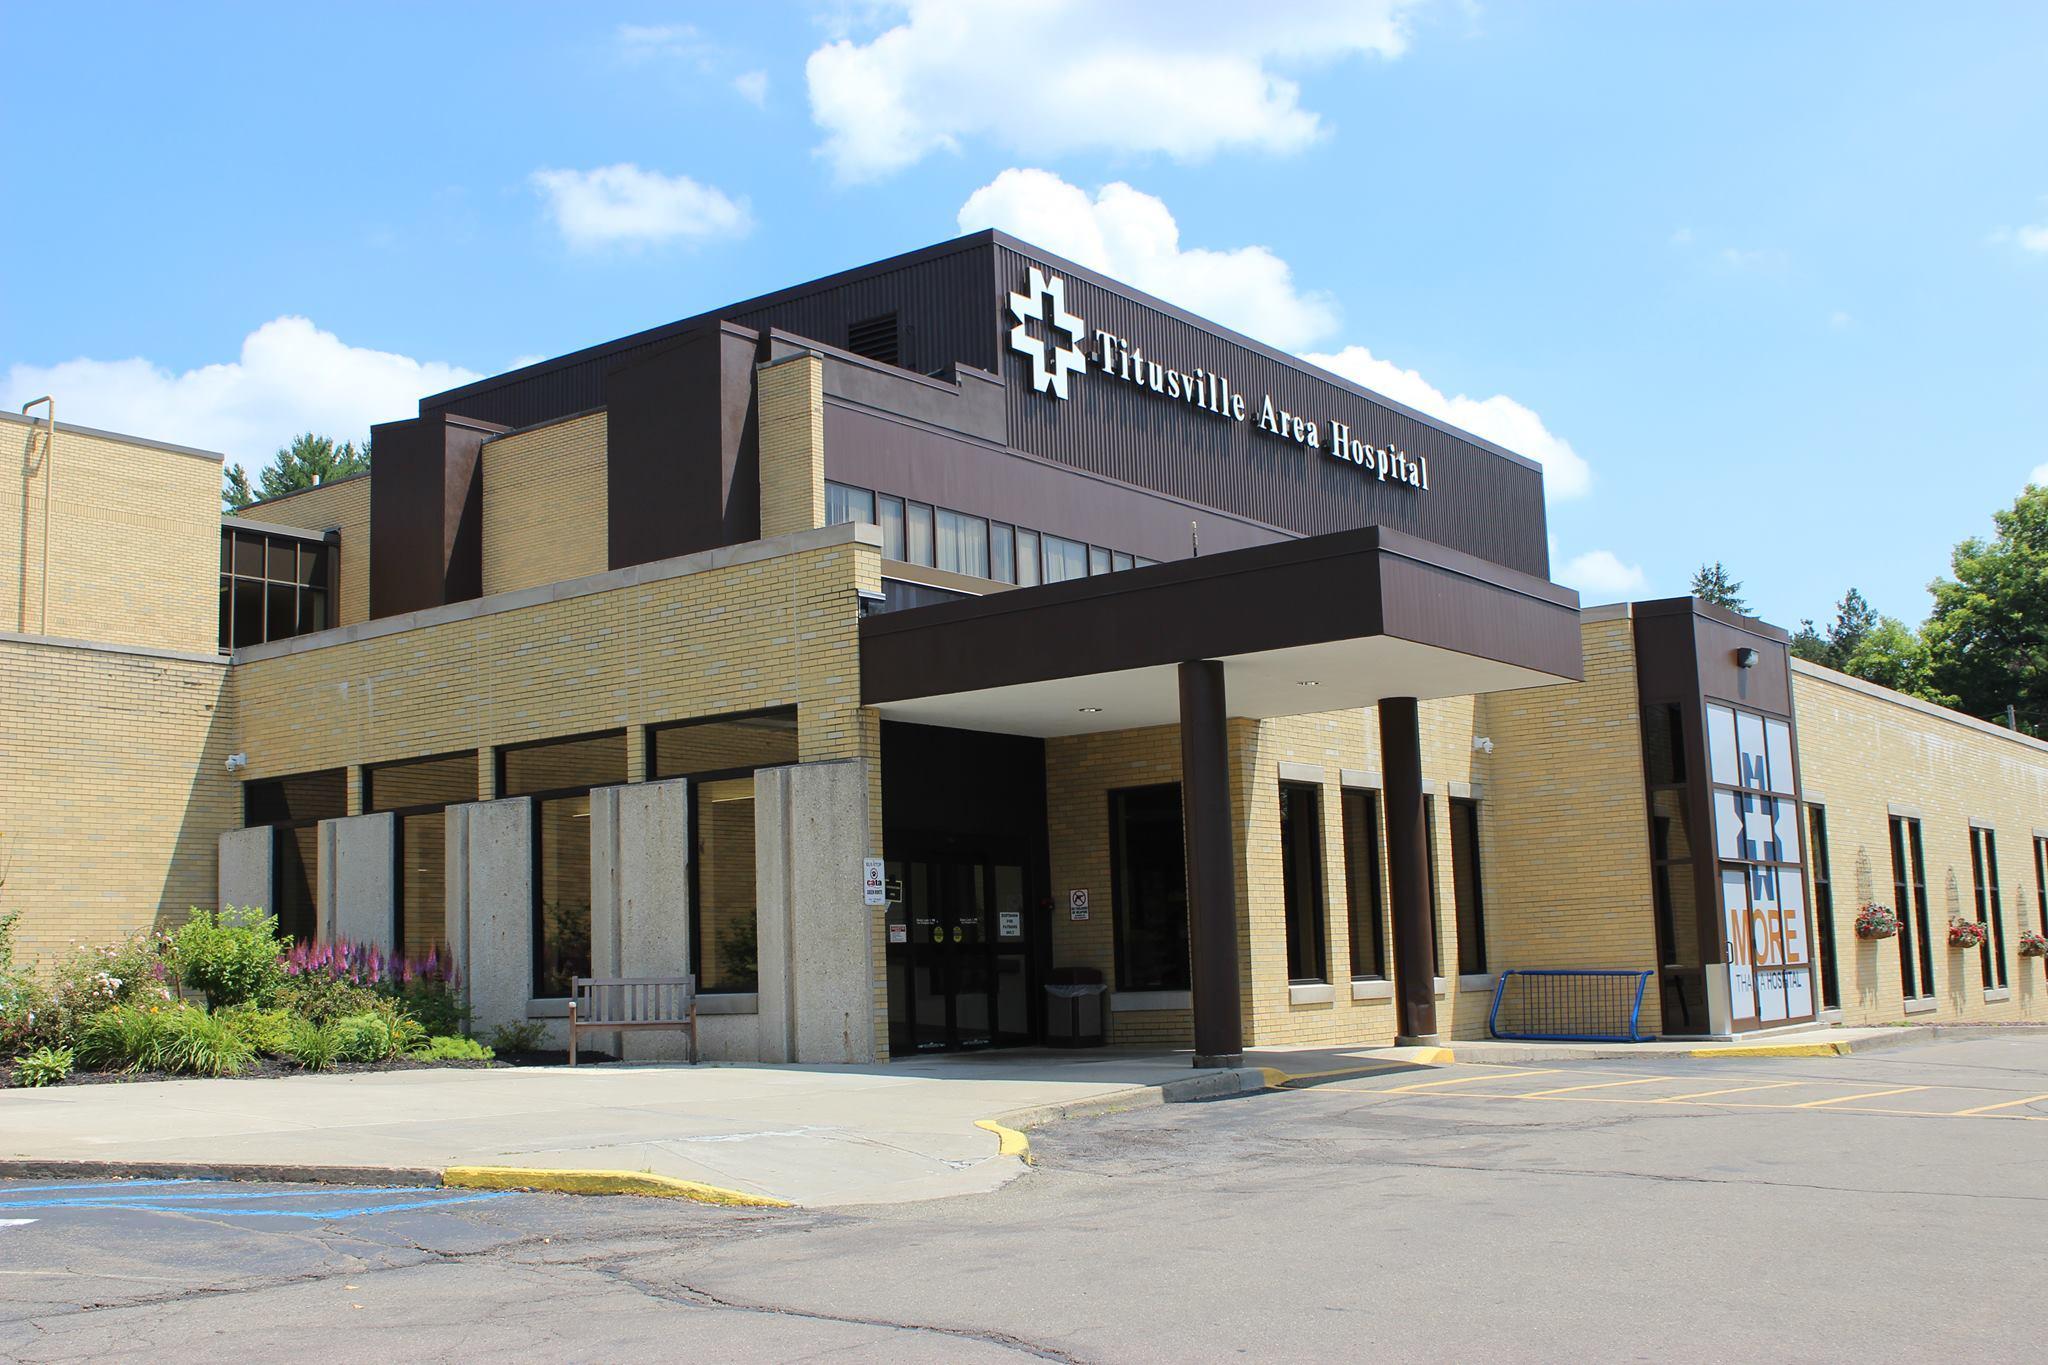 Image of Titusville Area Hospital Exterior